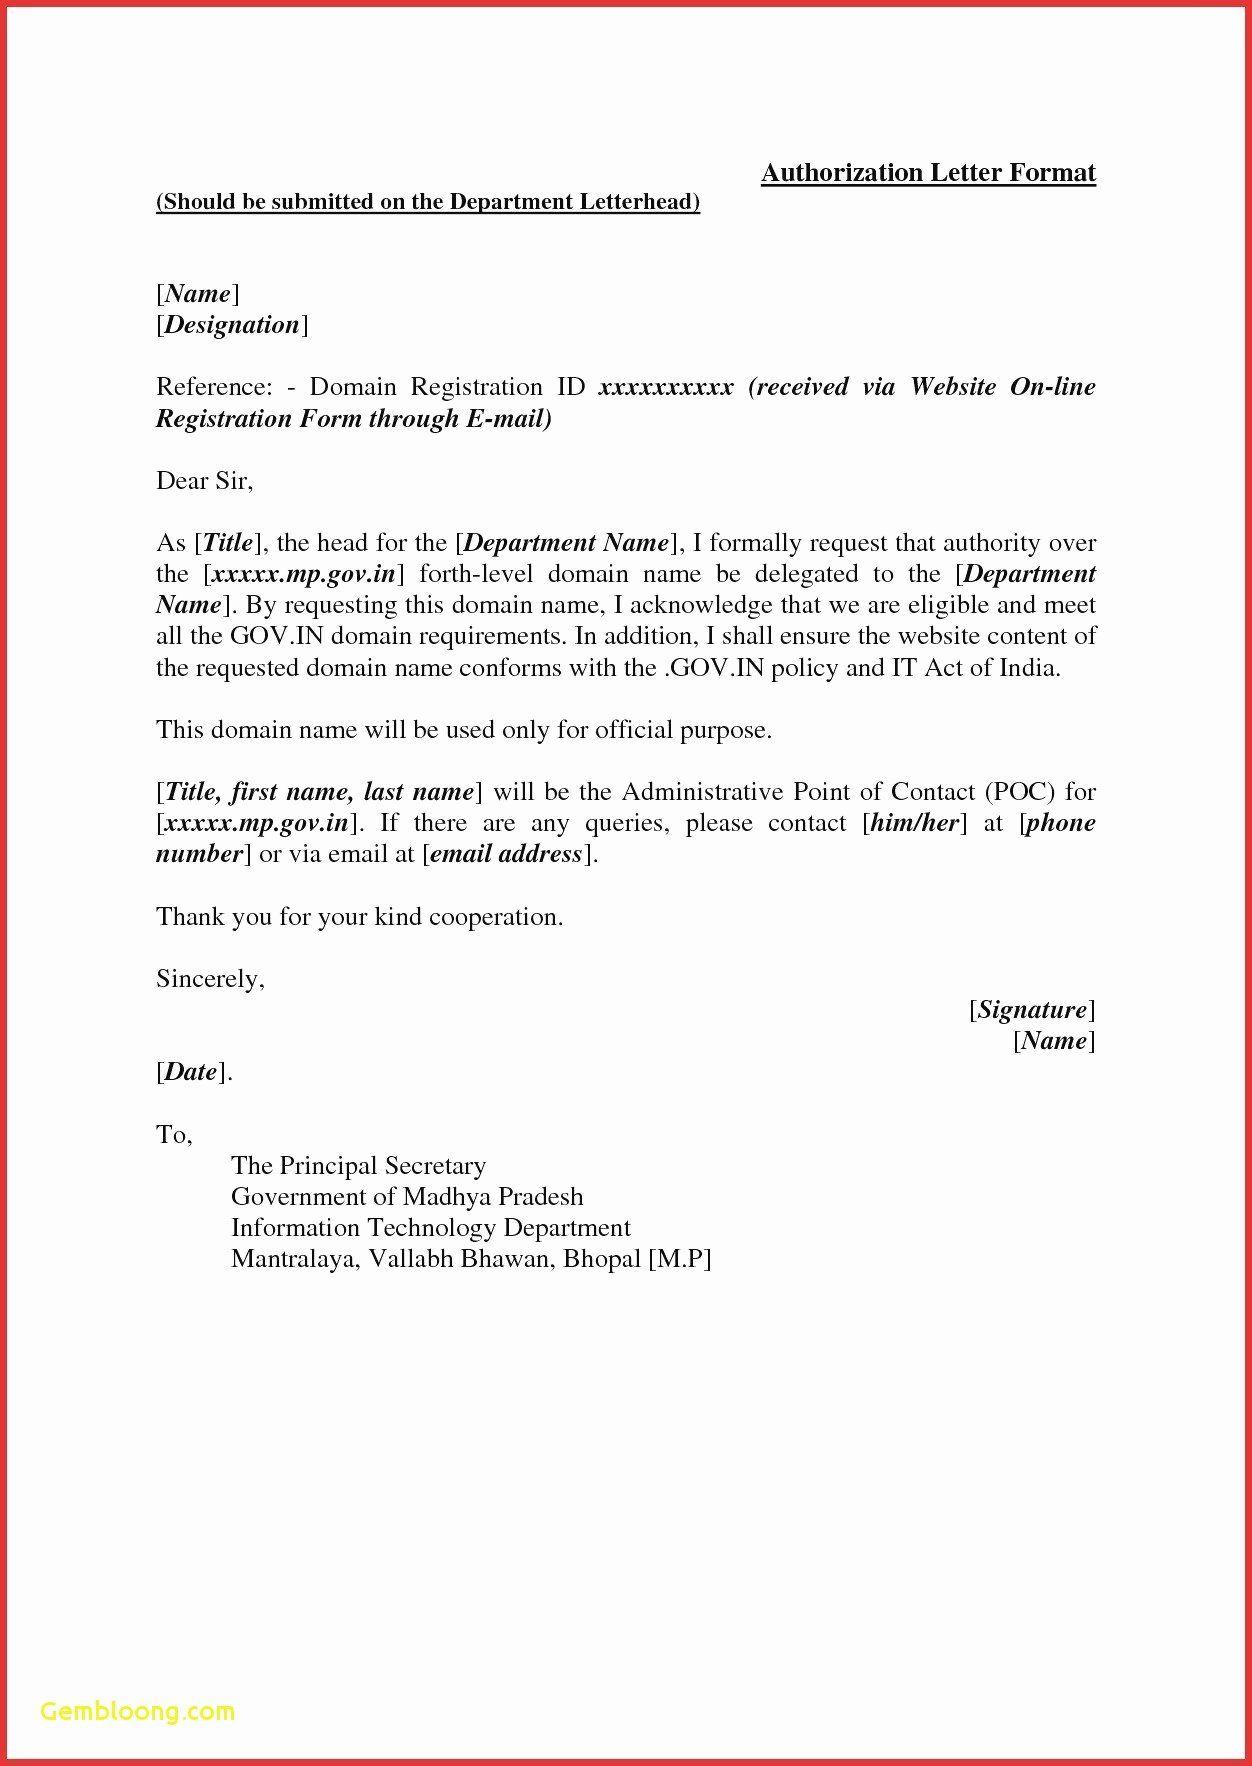 Vendor Recommendation Letter Samples Roho 4senses Co Pertaining